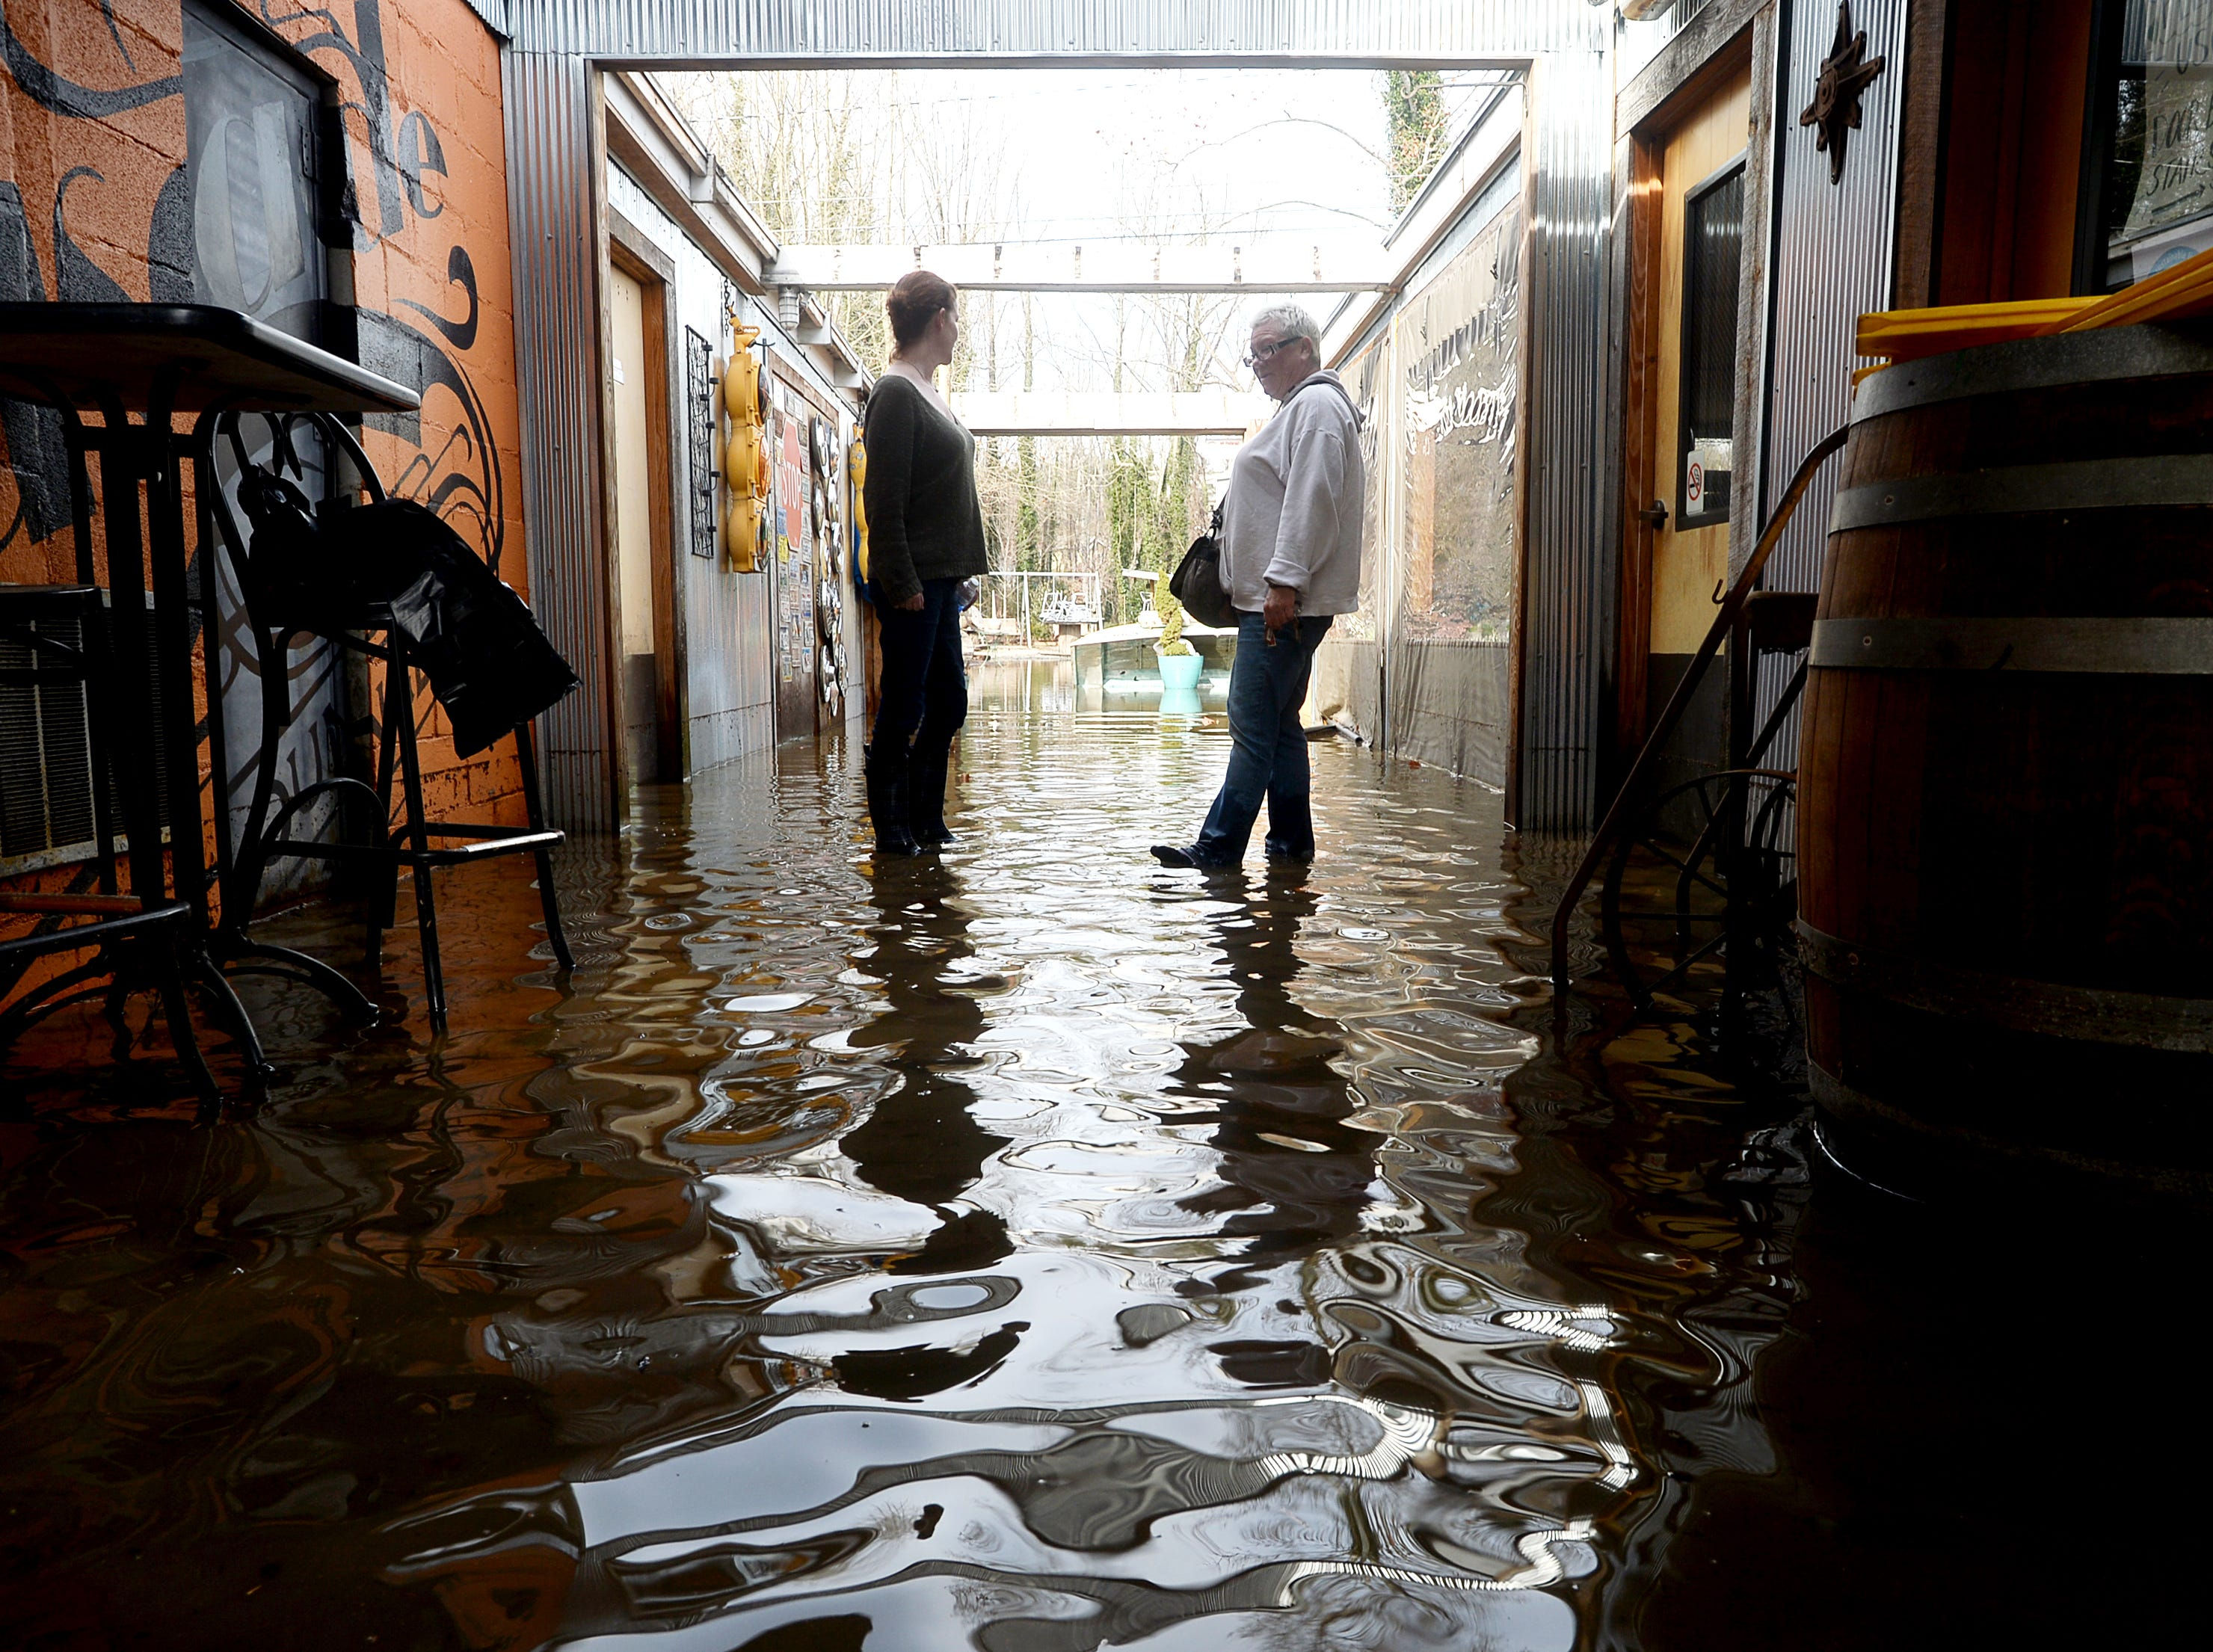 Jennifer Pittman, left, and Terri Terrell wade through water between the Cascade Lounge and HomeGrown in West Asheville Dec. 29, 2018.